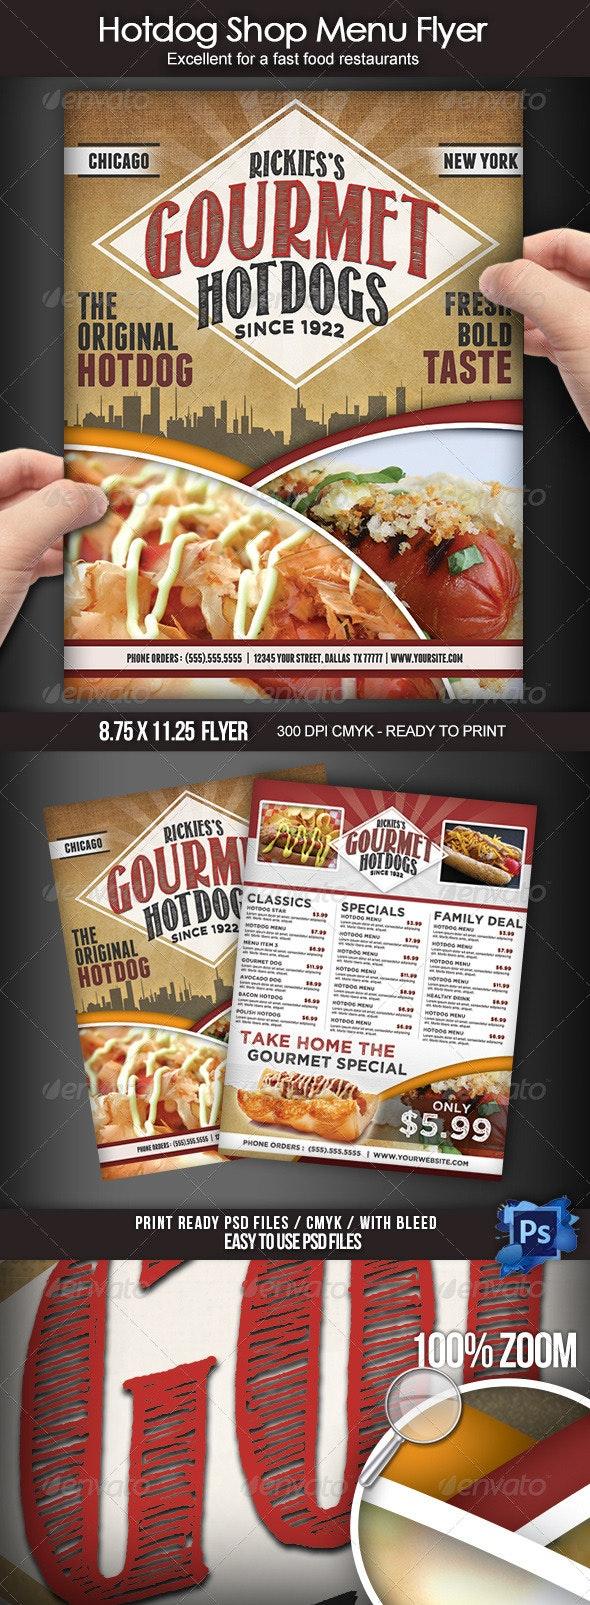 Hotdog Shop Menu Flyer - Food Menus Print Templates